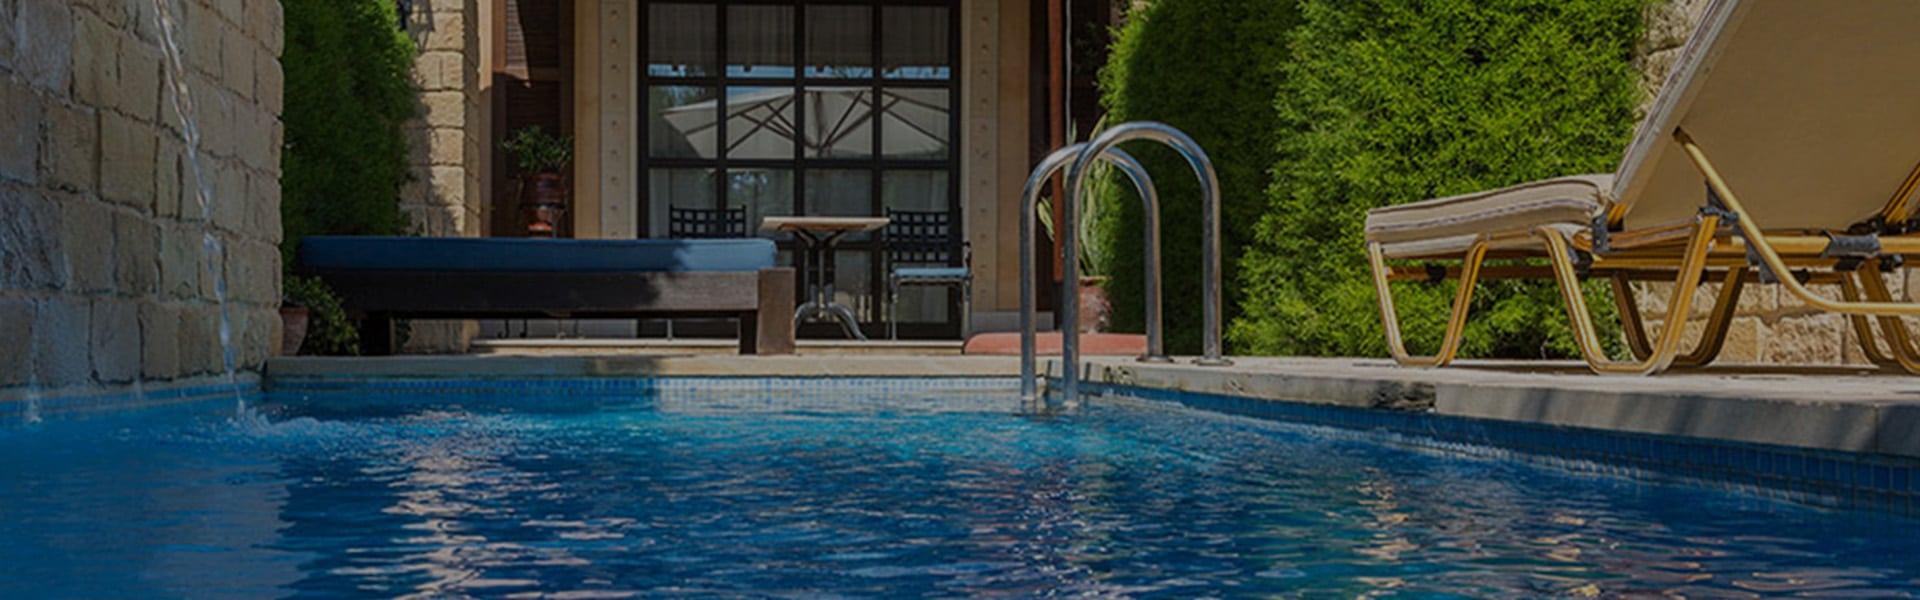 Pool leak detection leak repair services in san antonio How to fix a swimming pool leak